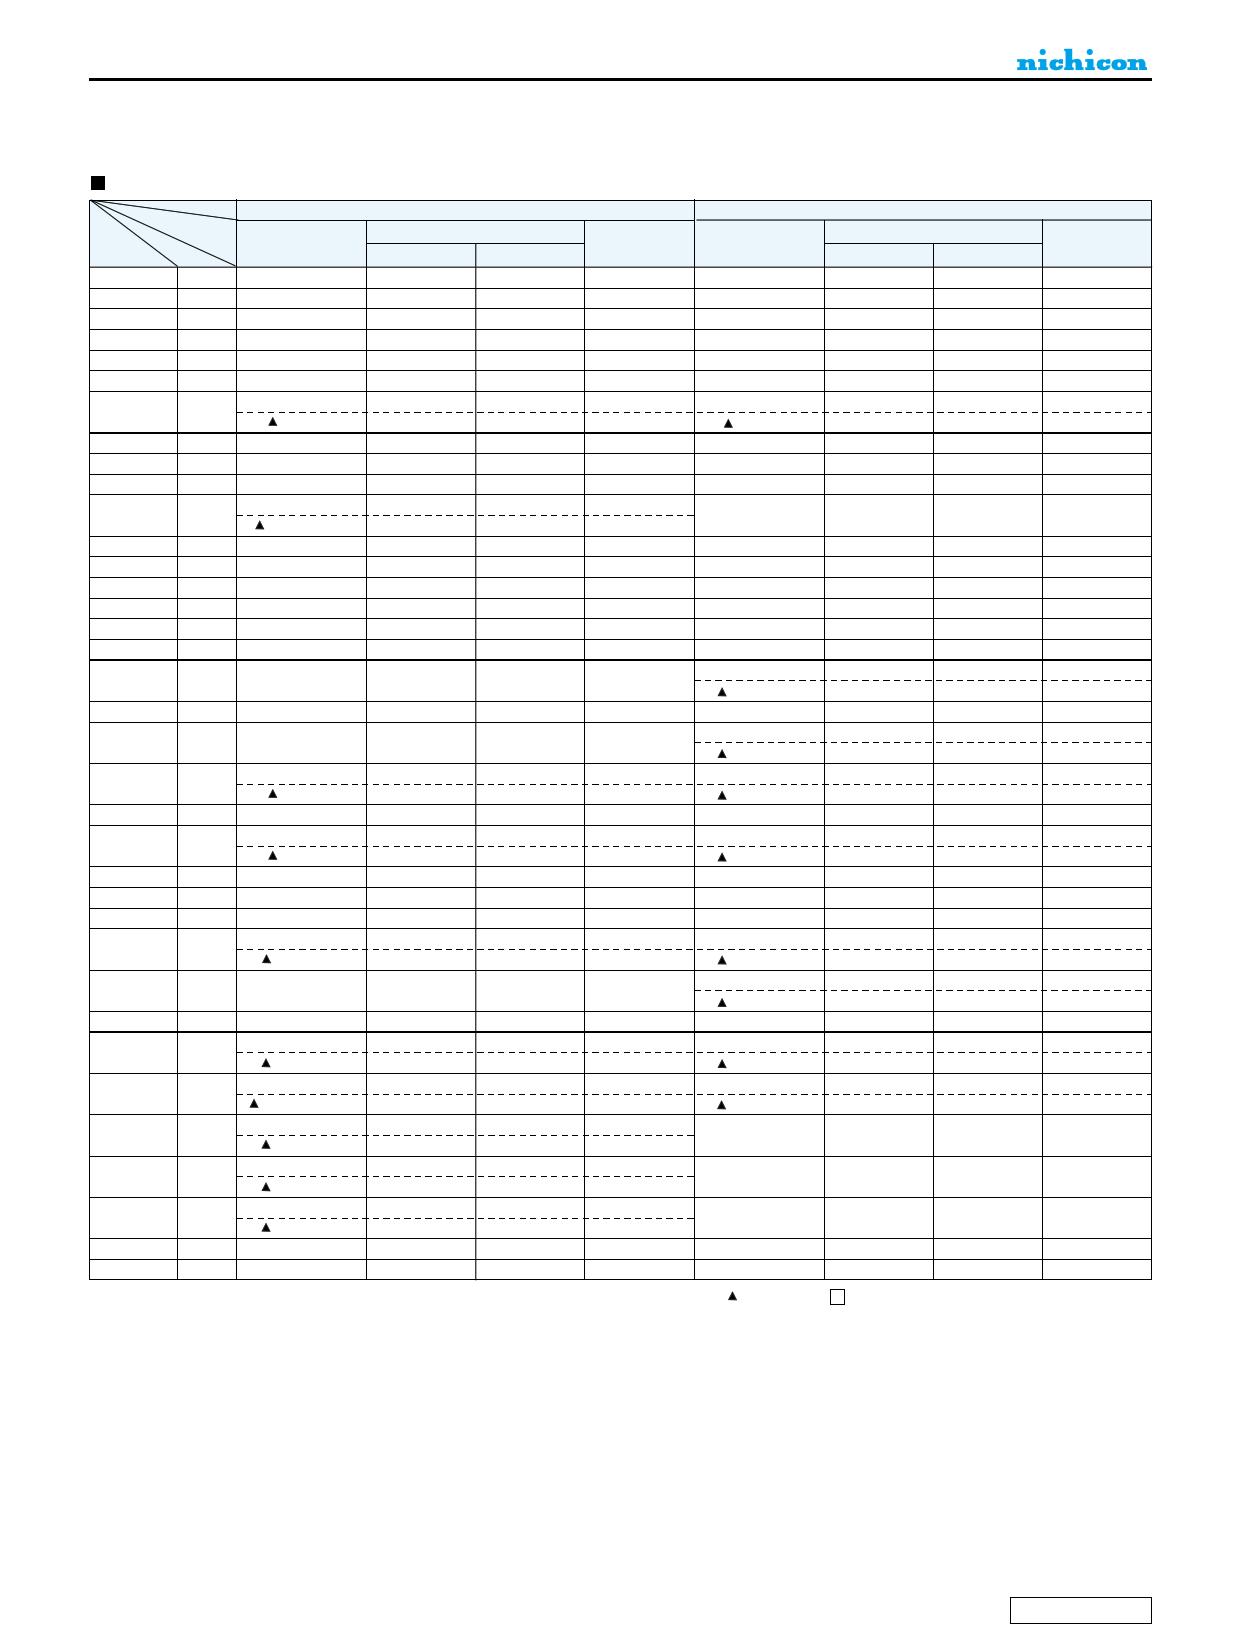 UPW1J471MHD6 pdf, 반도체, 판매, 대치품